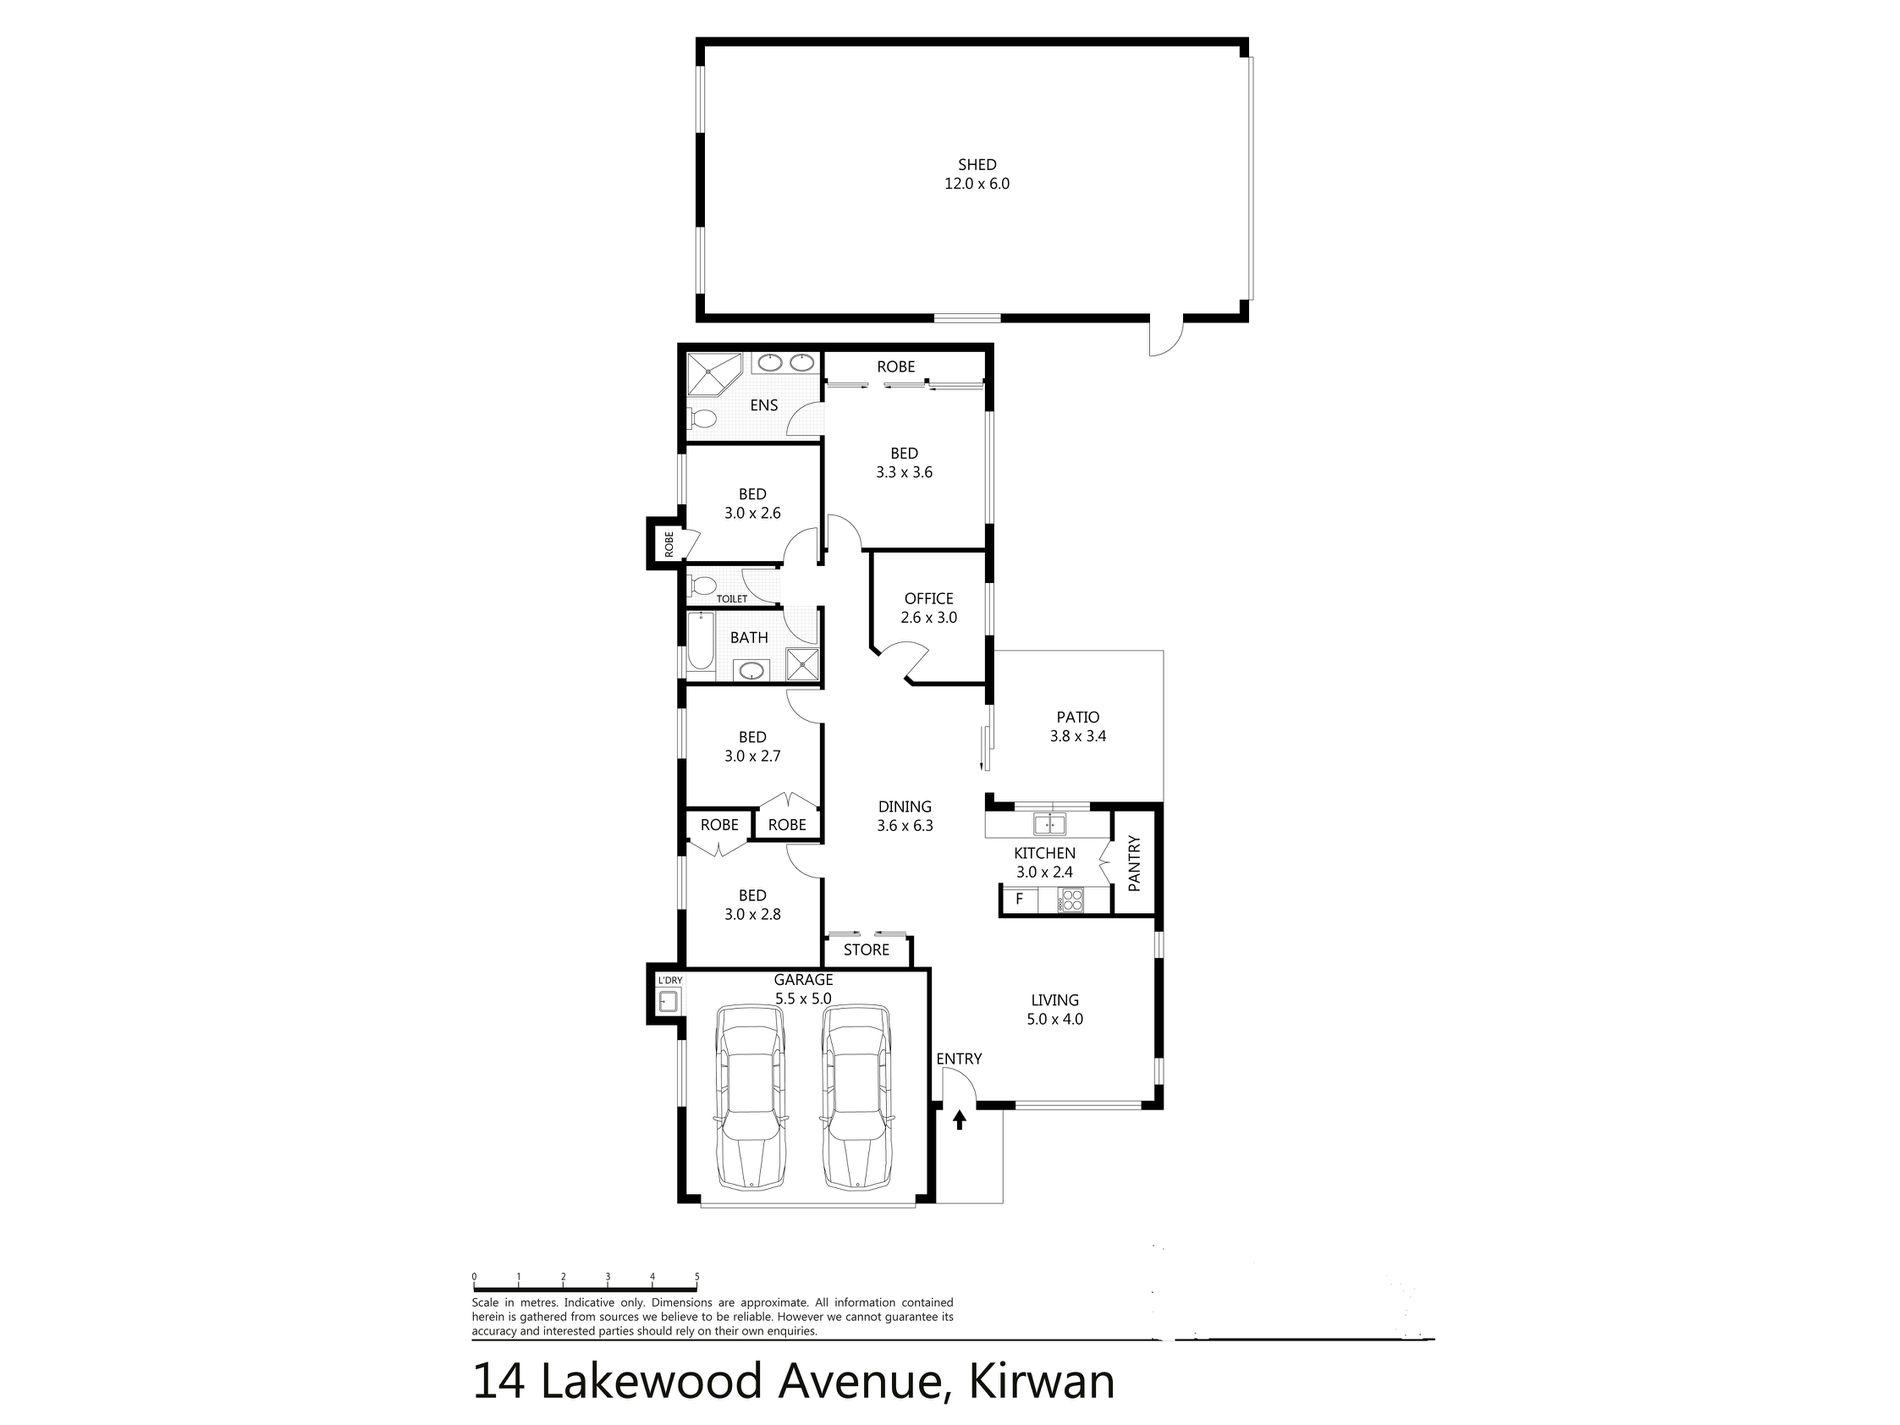 14 Lakewood Avenue, Kirwan